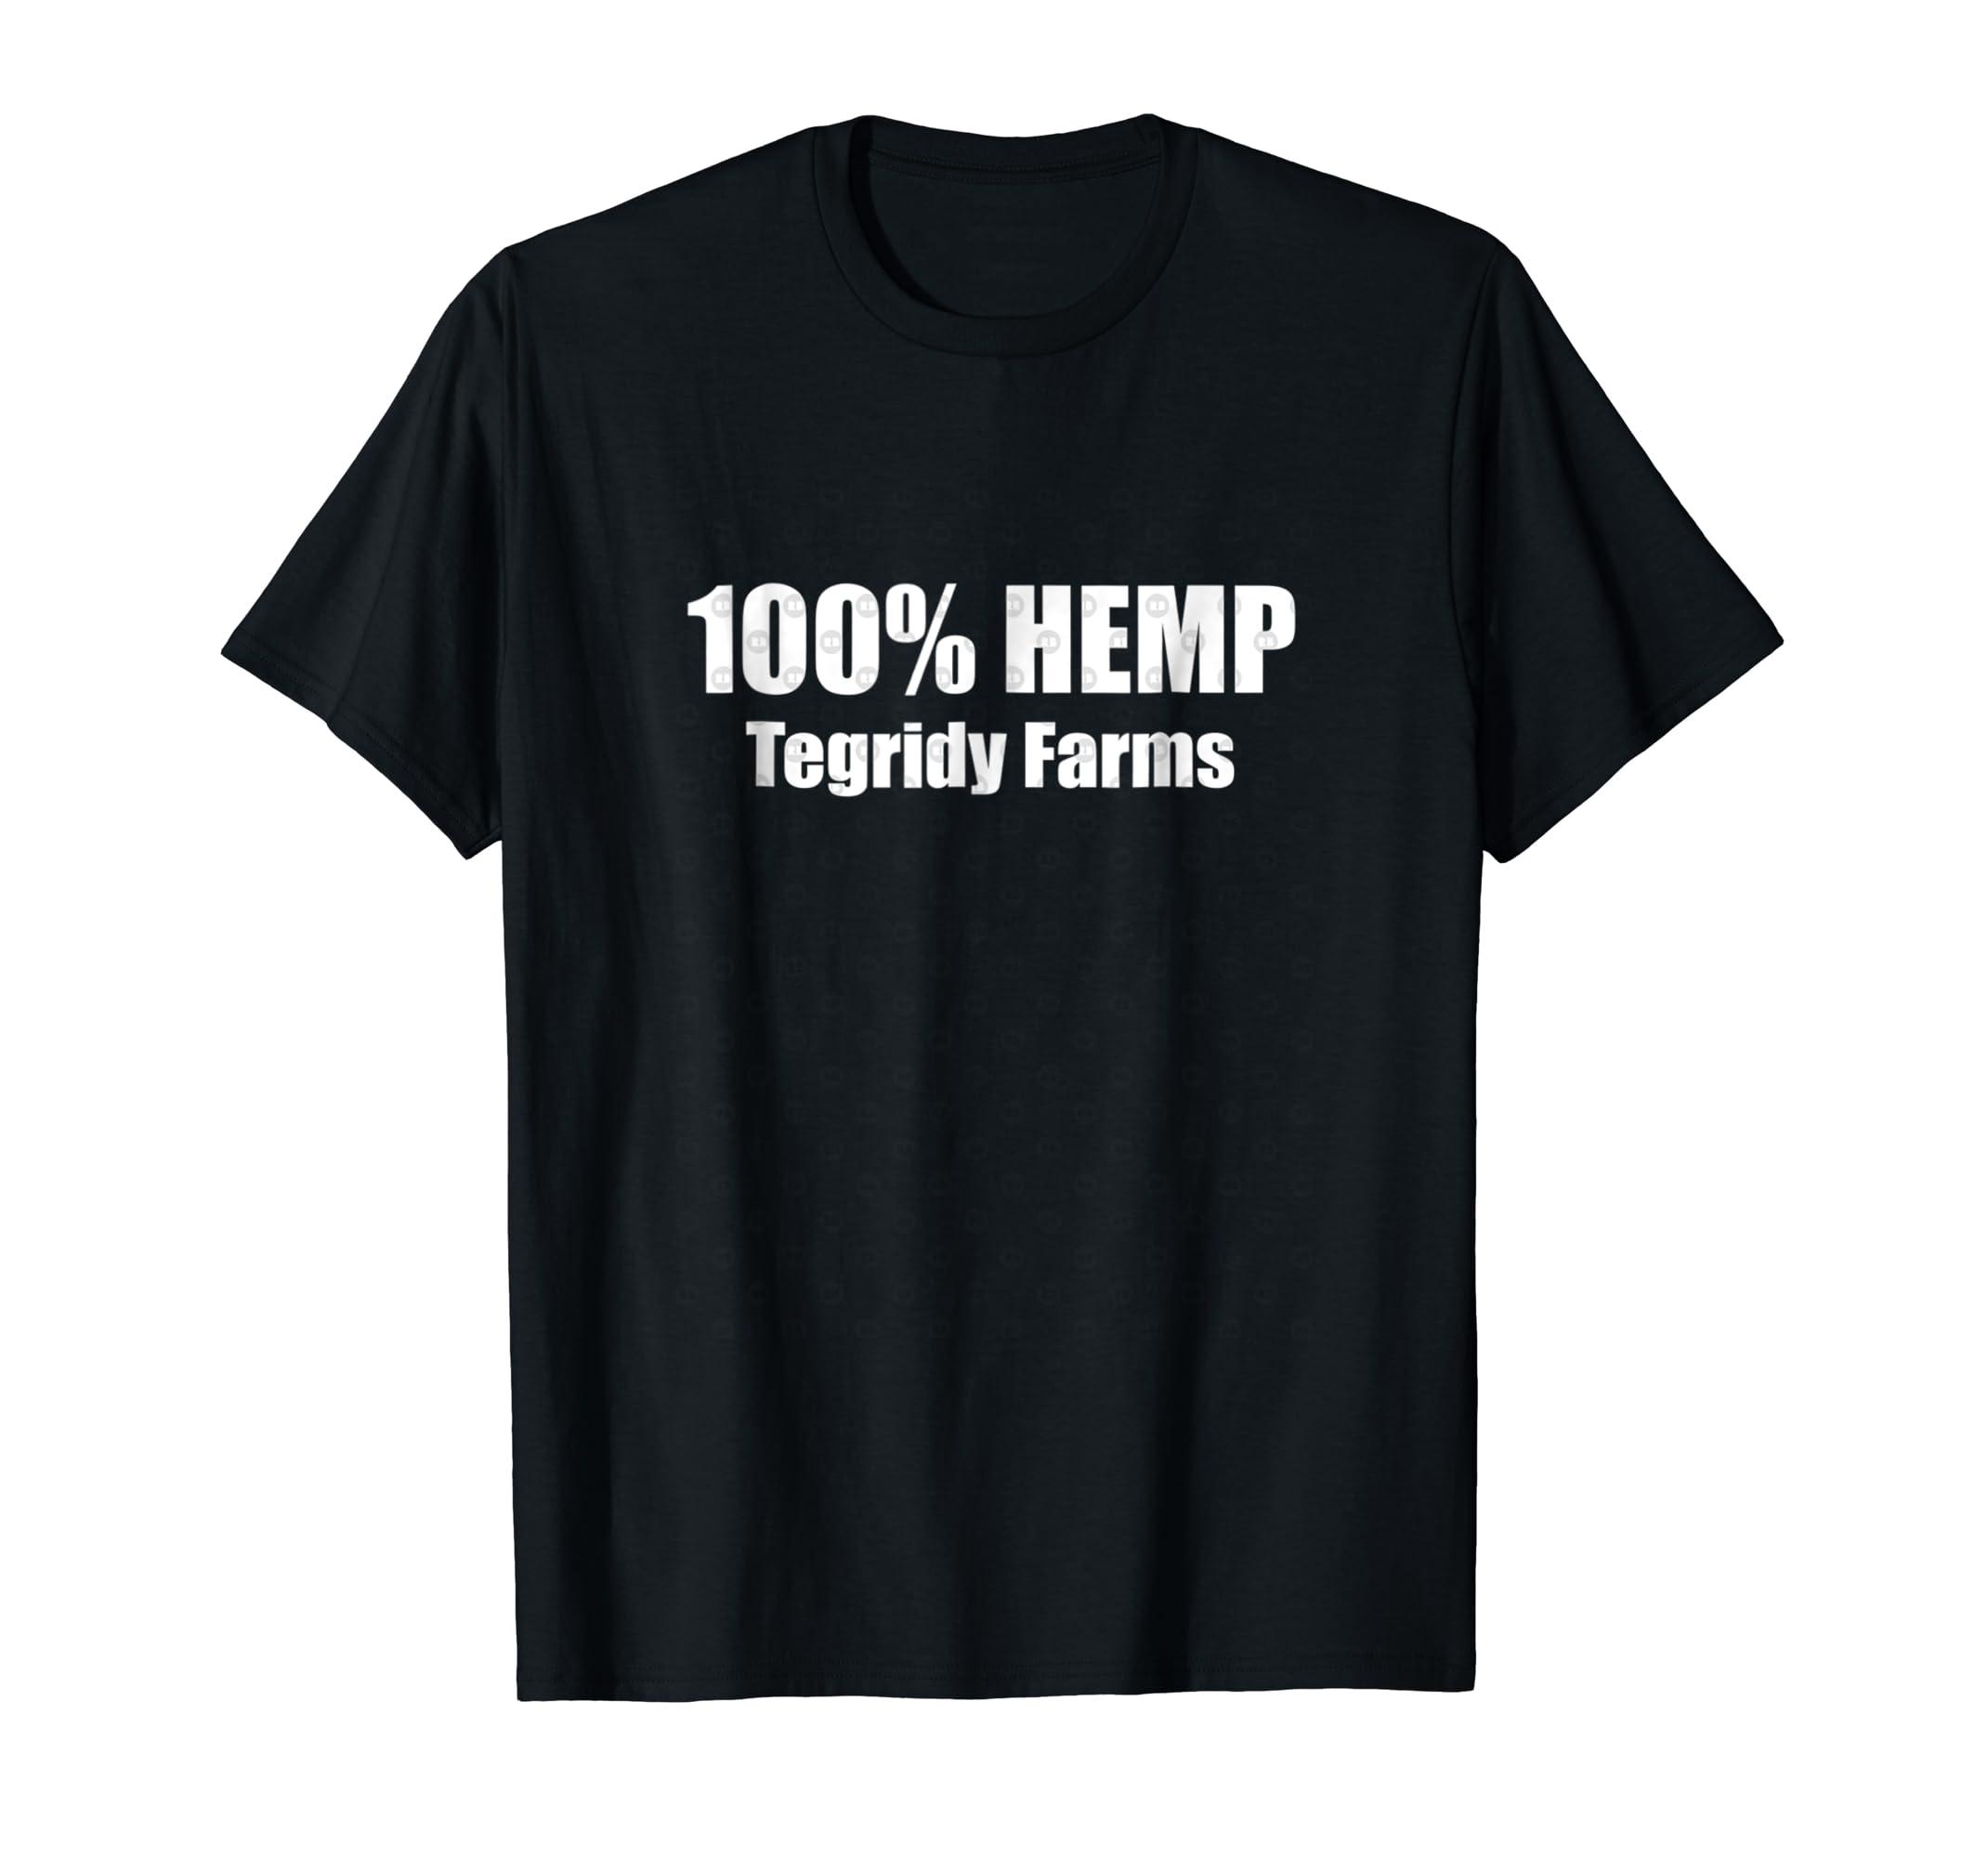 43eddb7c Amazon.com: 100% HEMP TEGRIDY FARMS shirt: Clothing